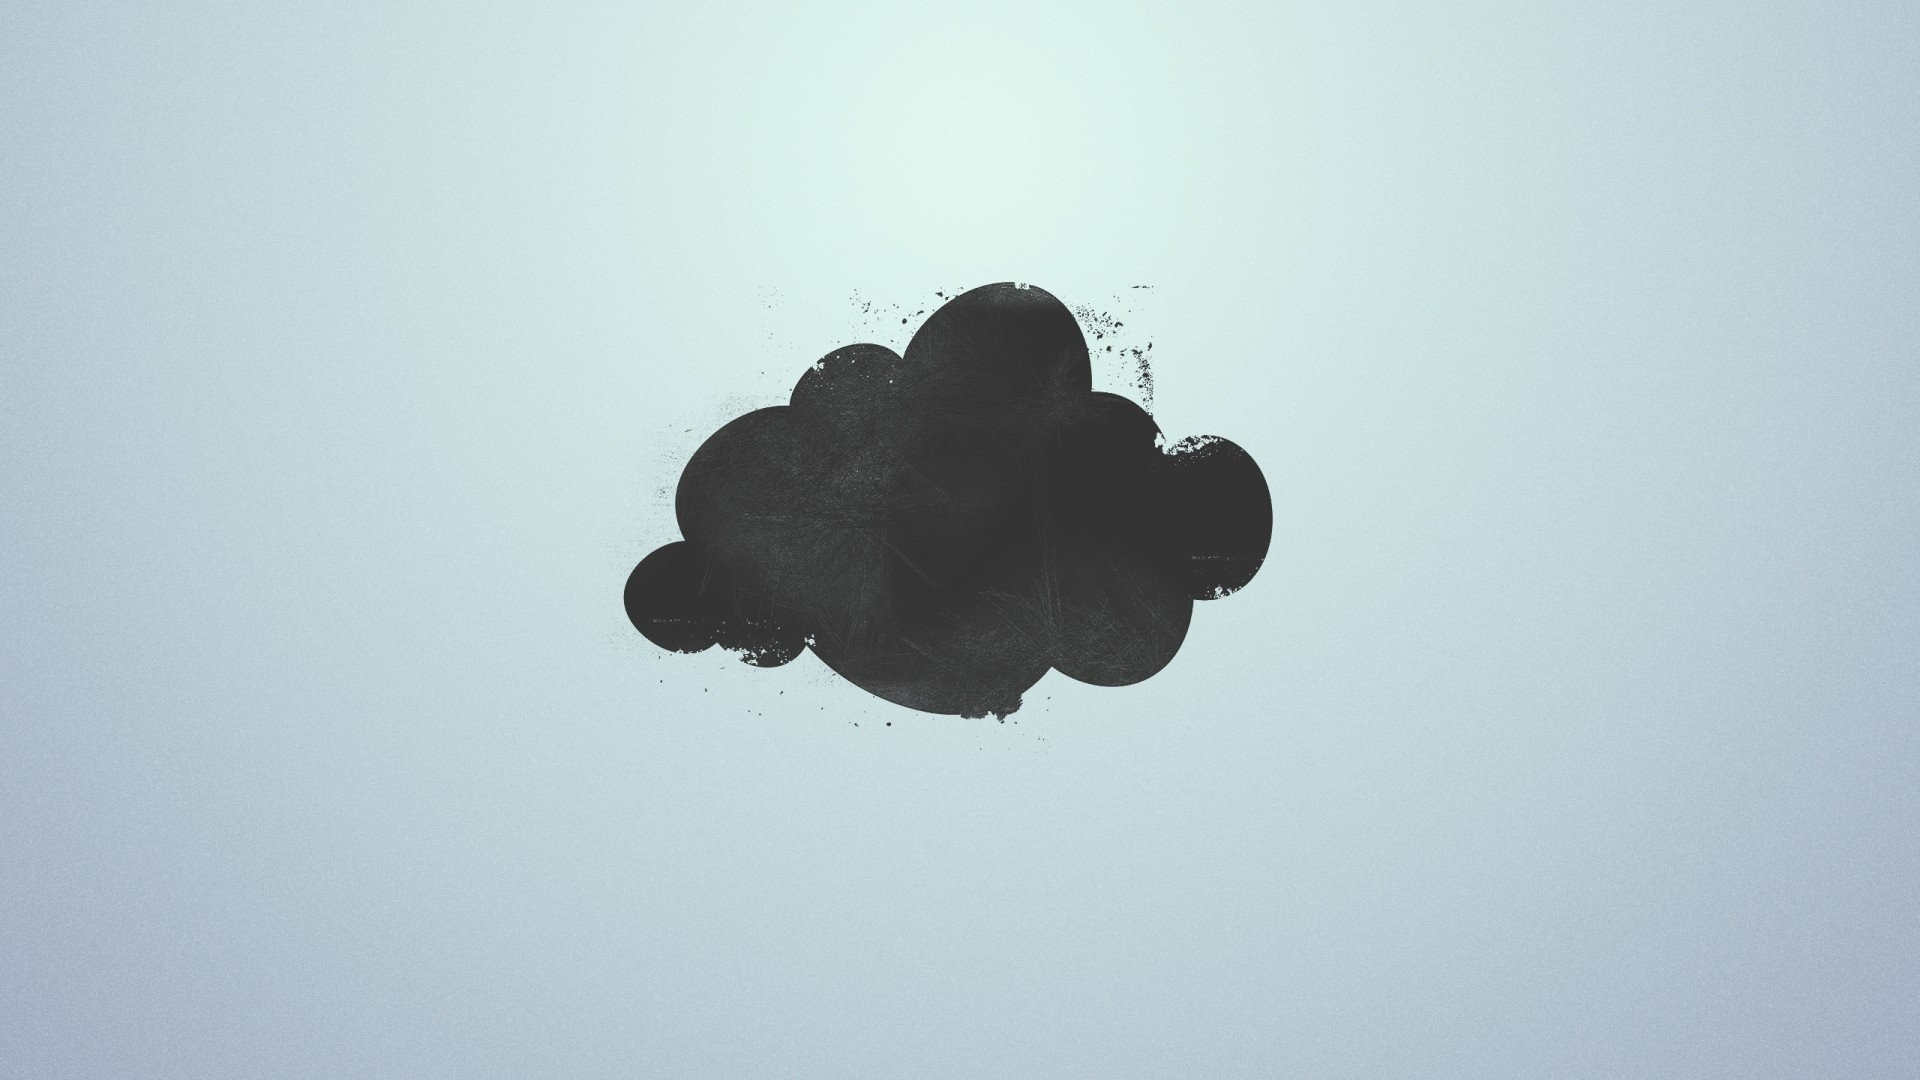 Clouds Digital Art Grey Background Grunge Minimalistic